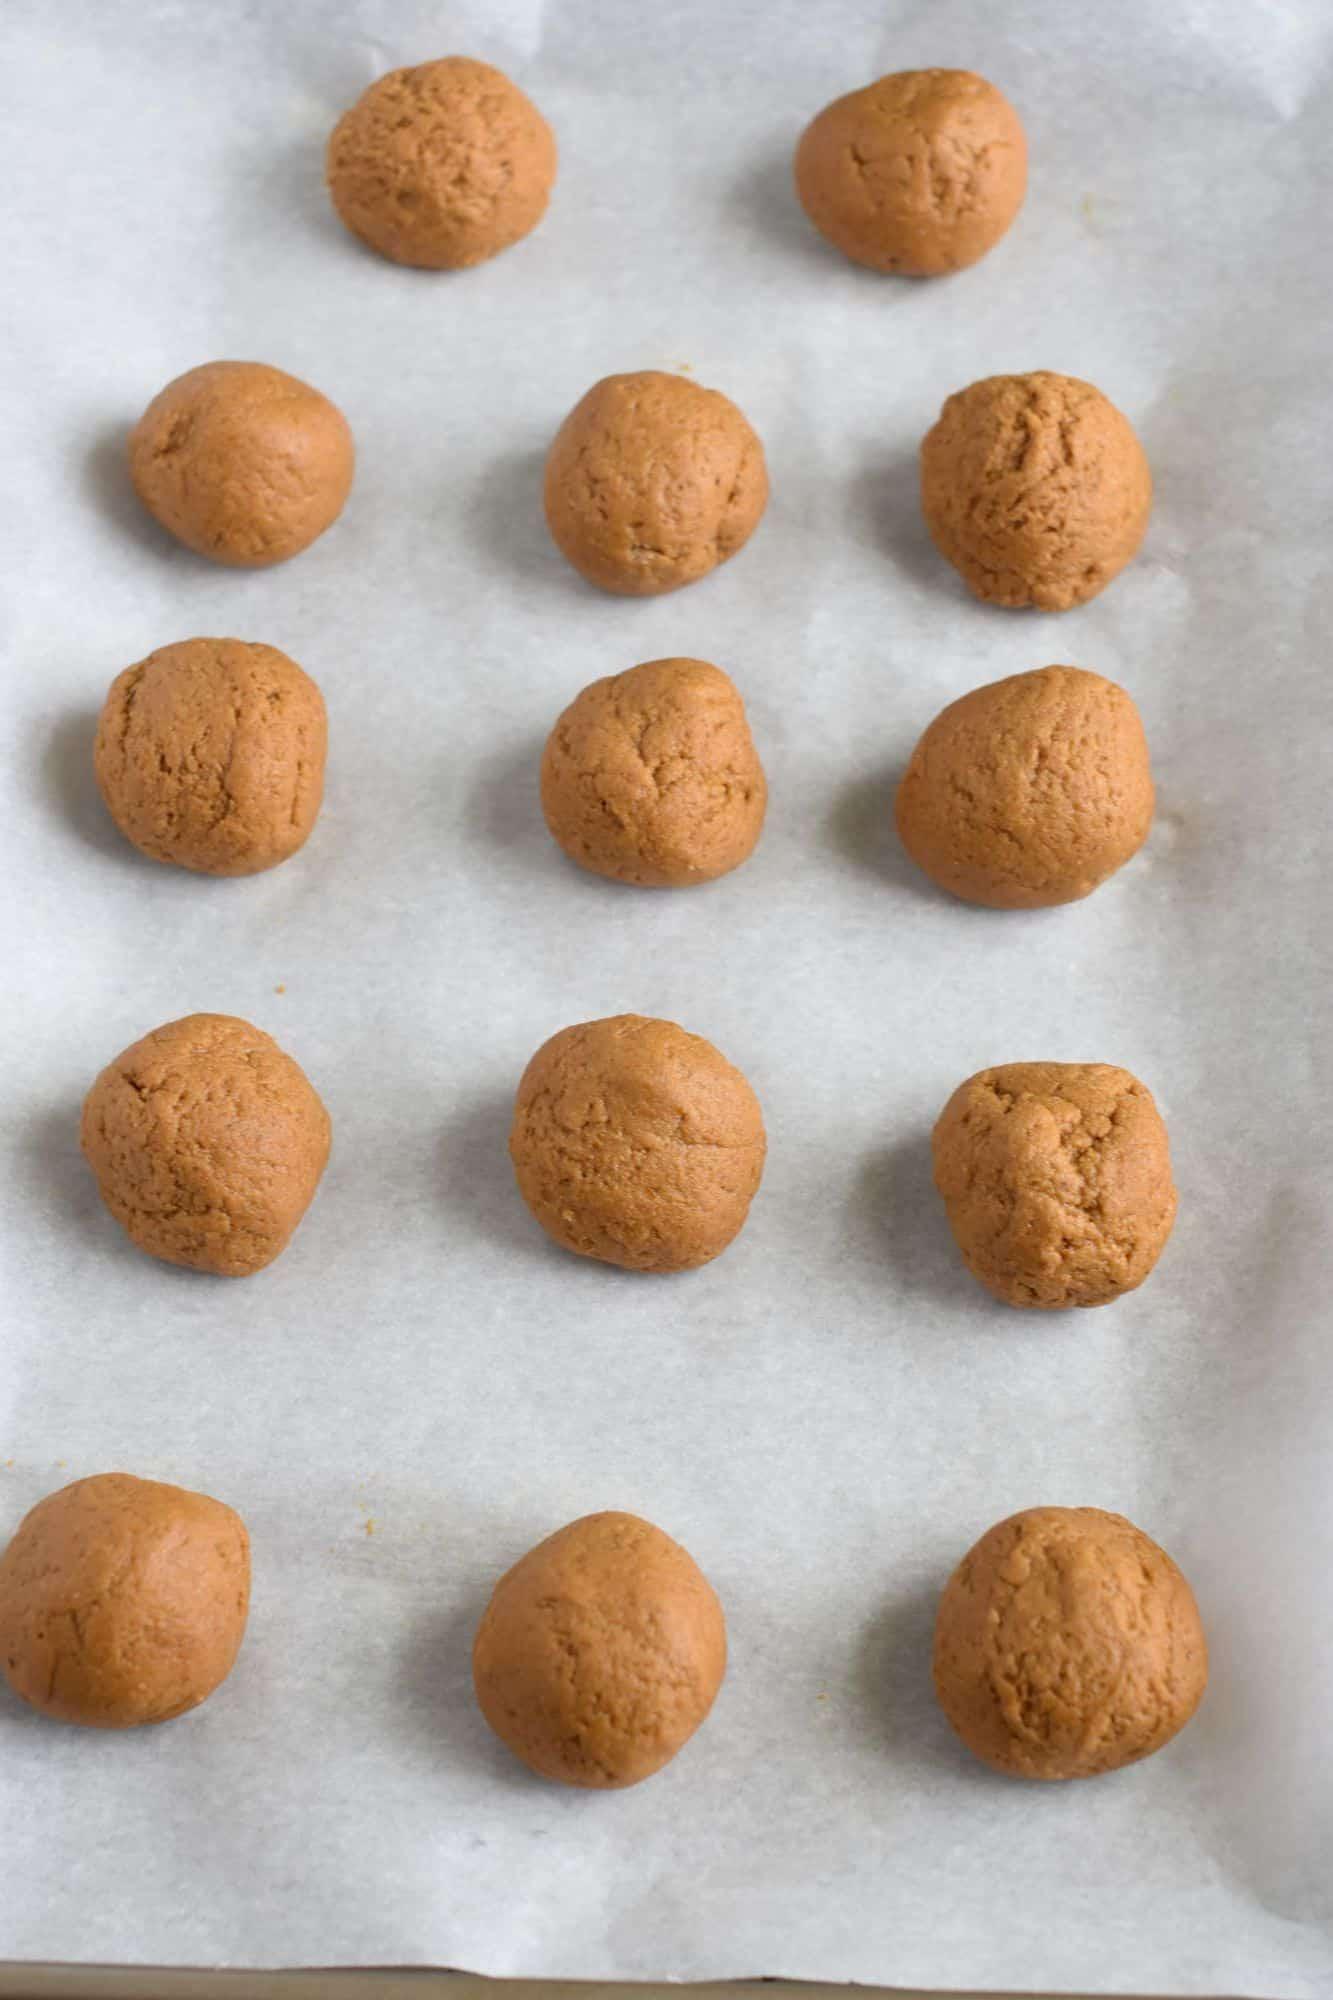 dough balls on a parchment-lined cookie sheet